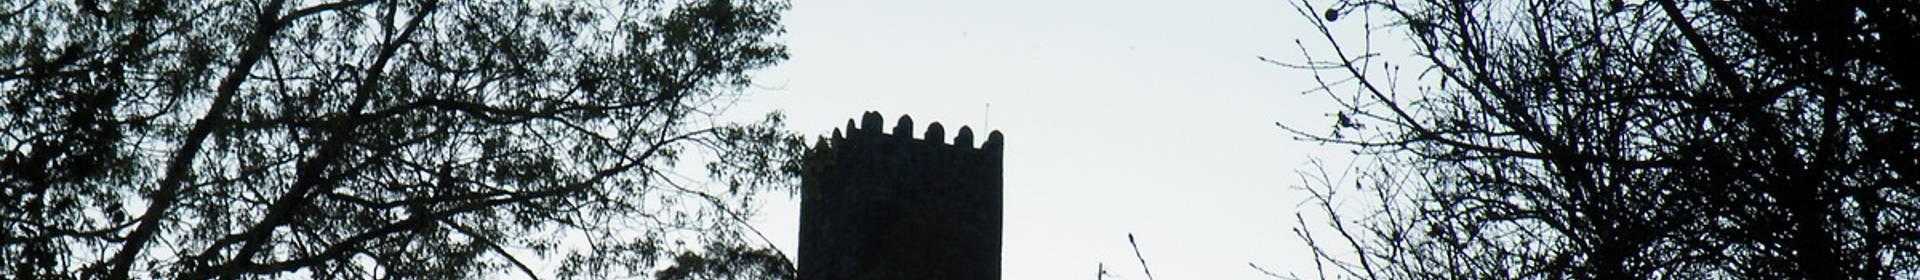 Celorico de Basto Municipality